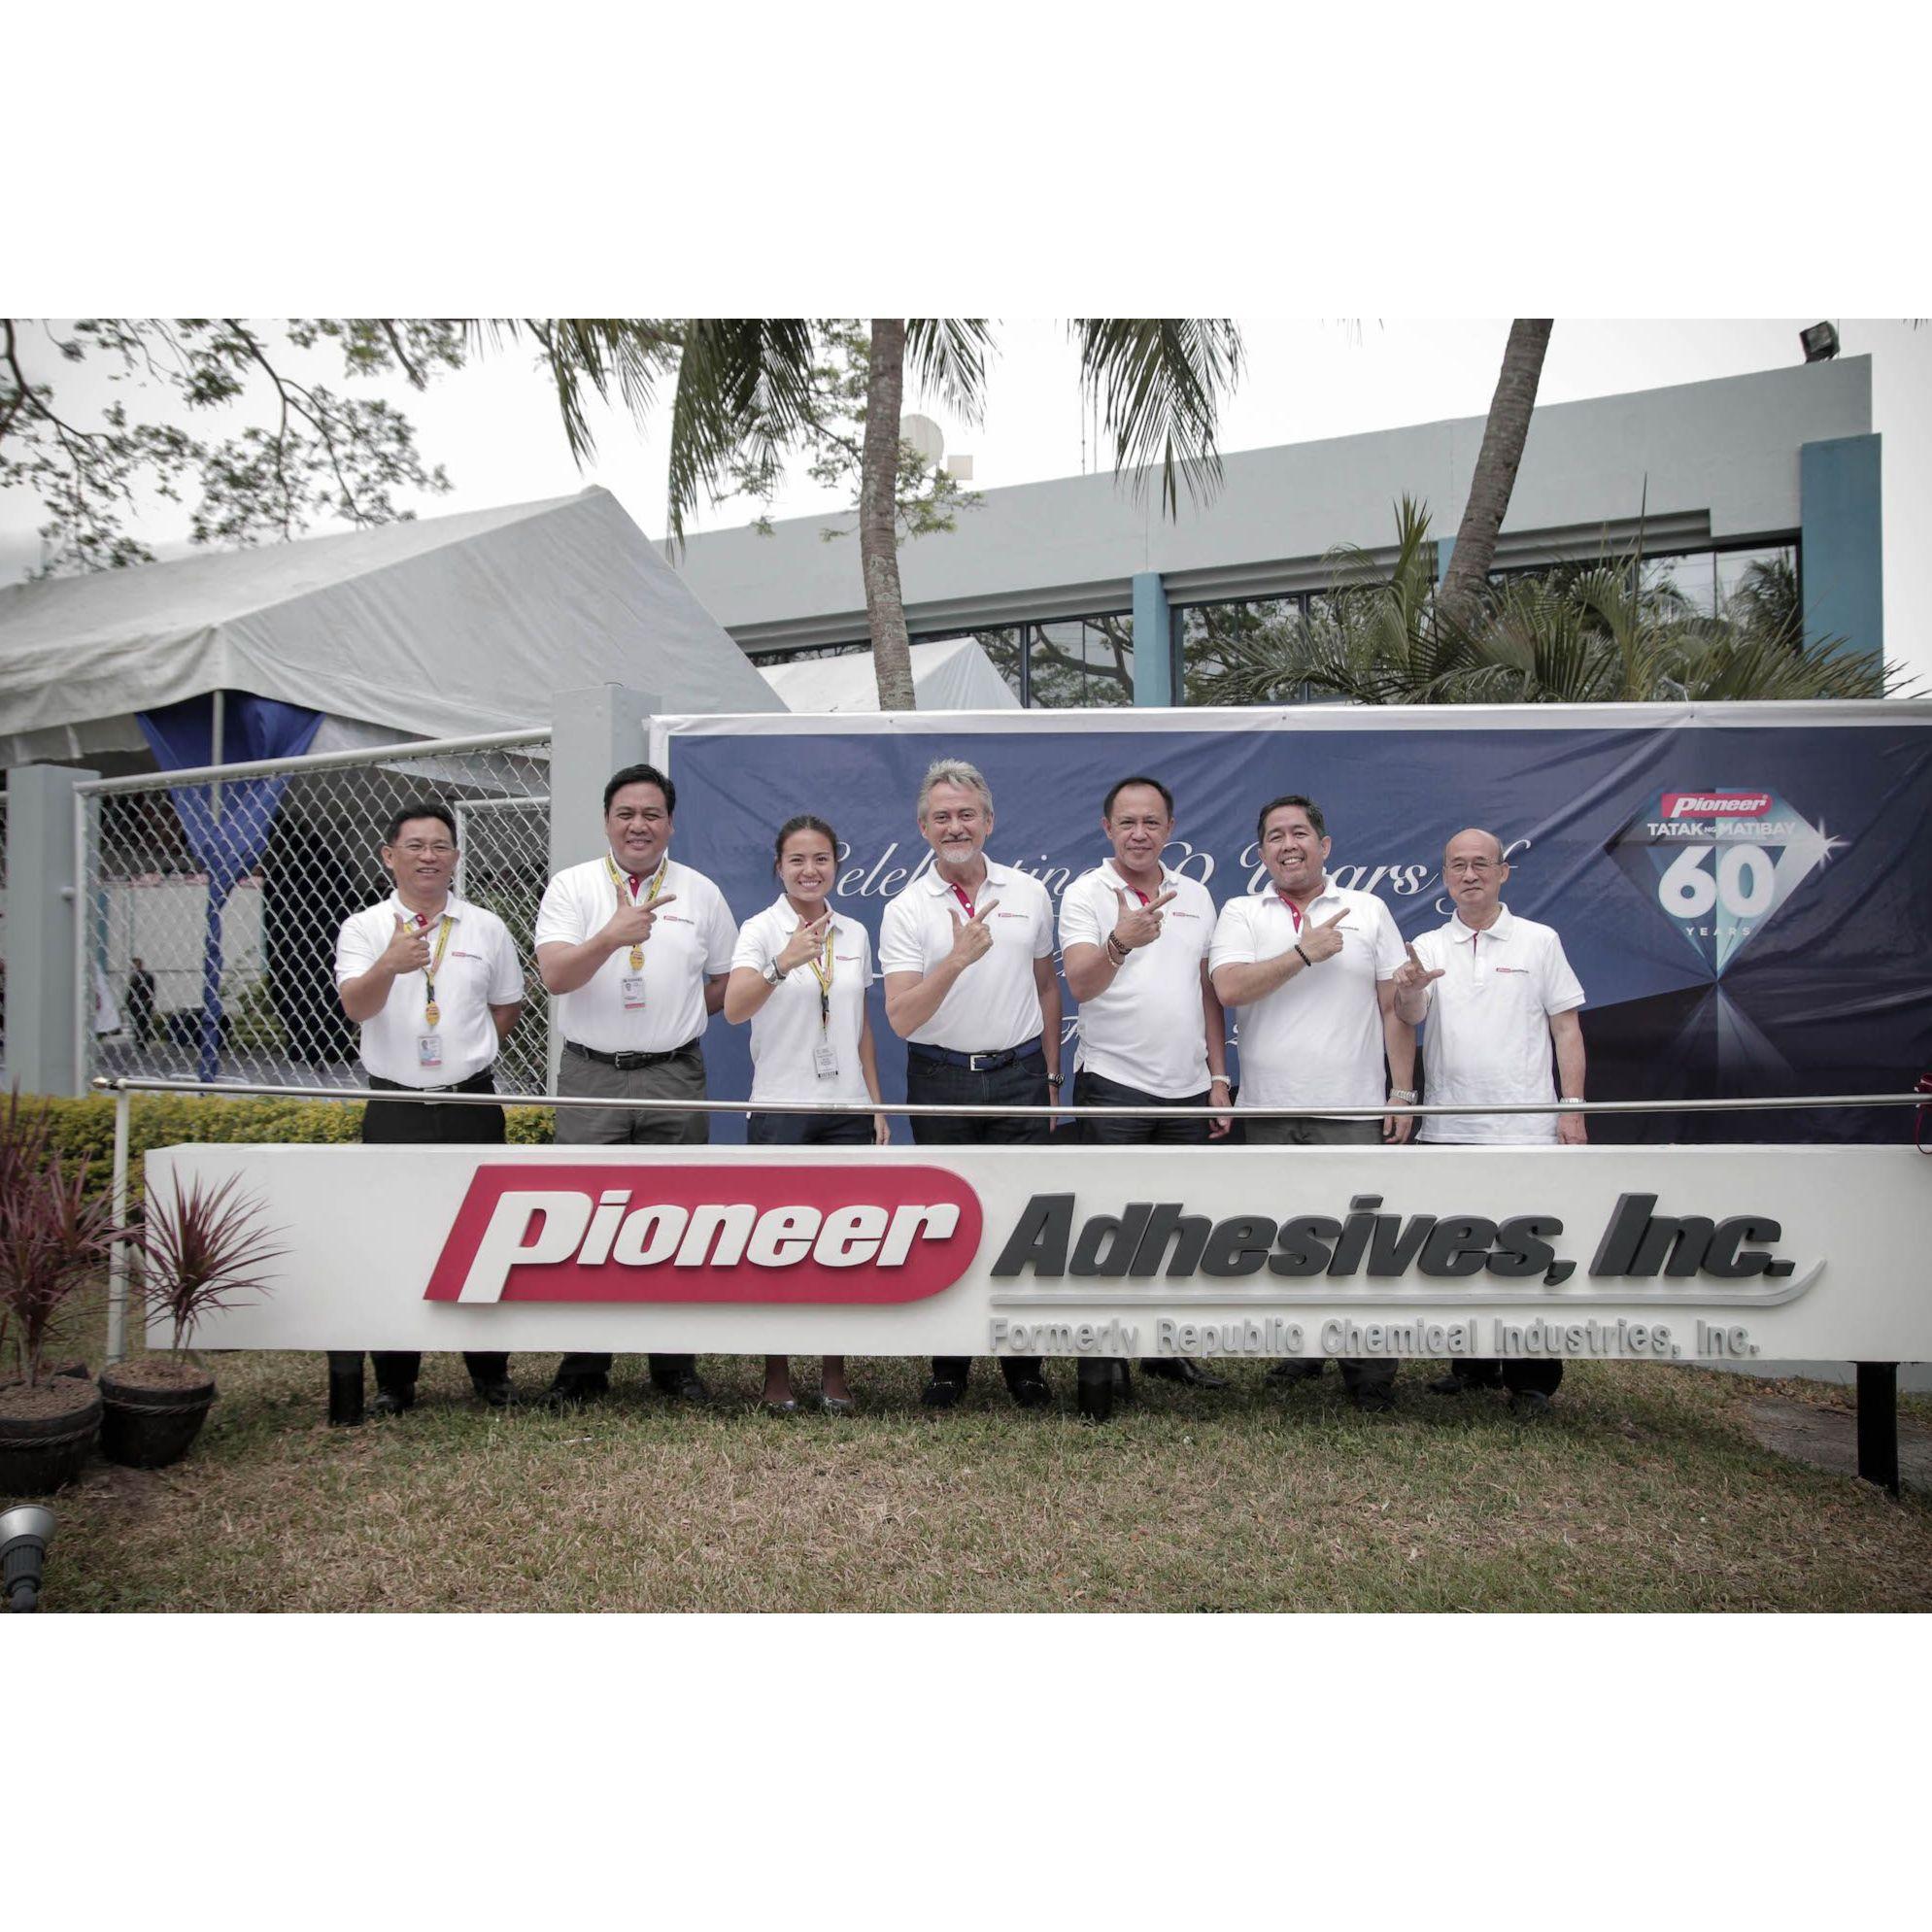 Pioneer Adhesives, Inc. photo 2